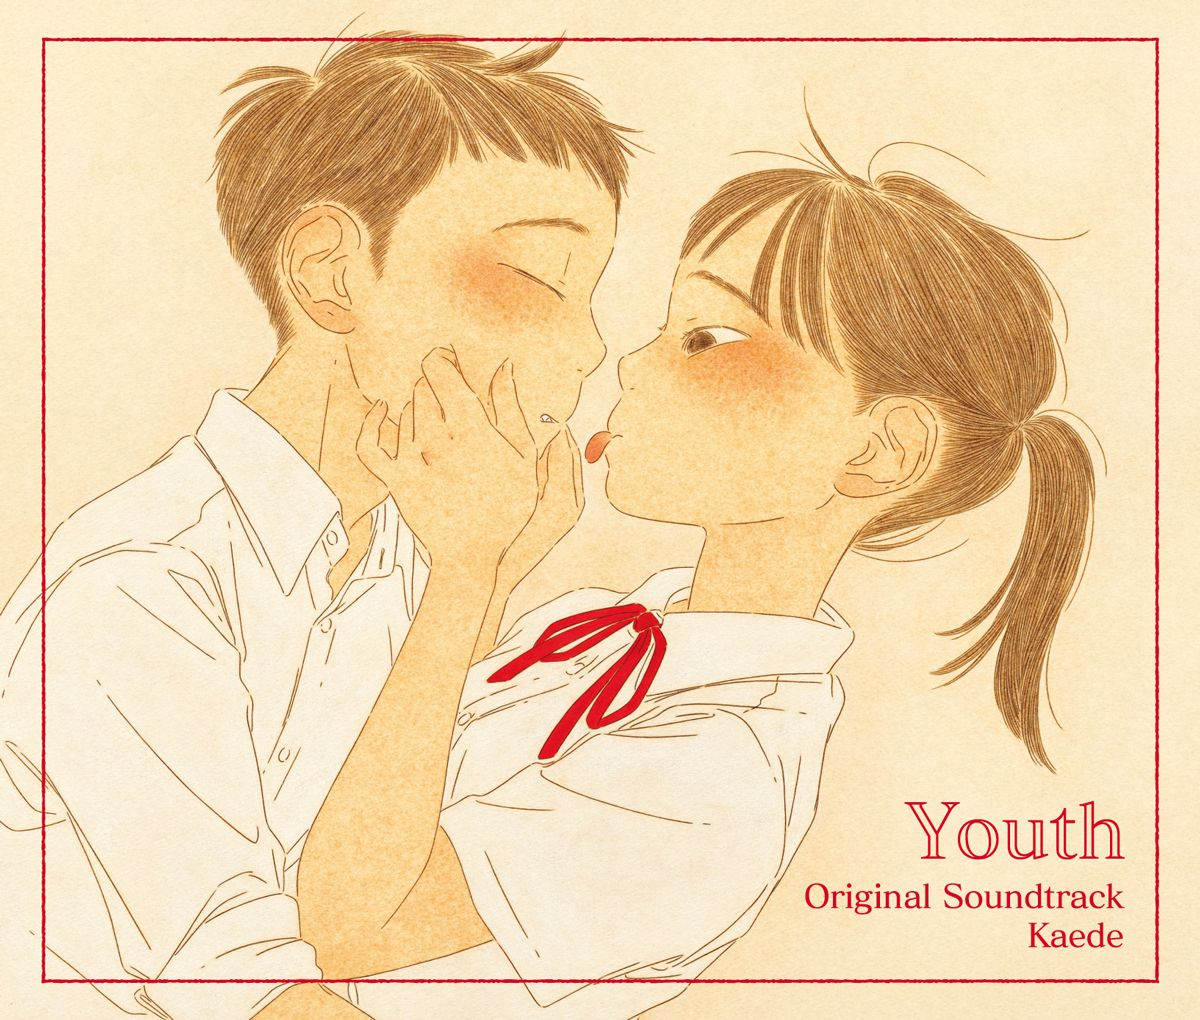 Youth - Original Soundtrack